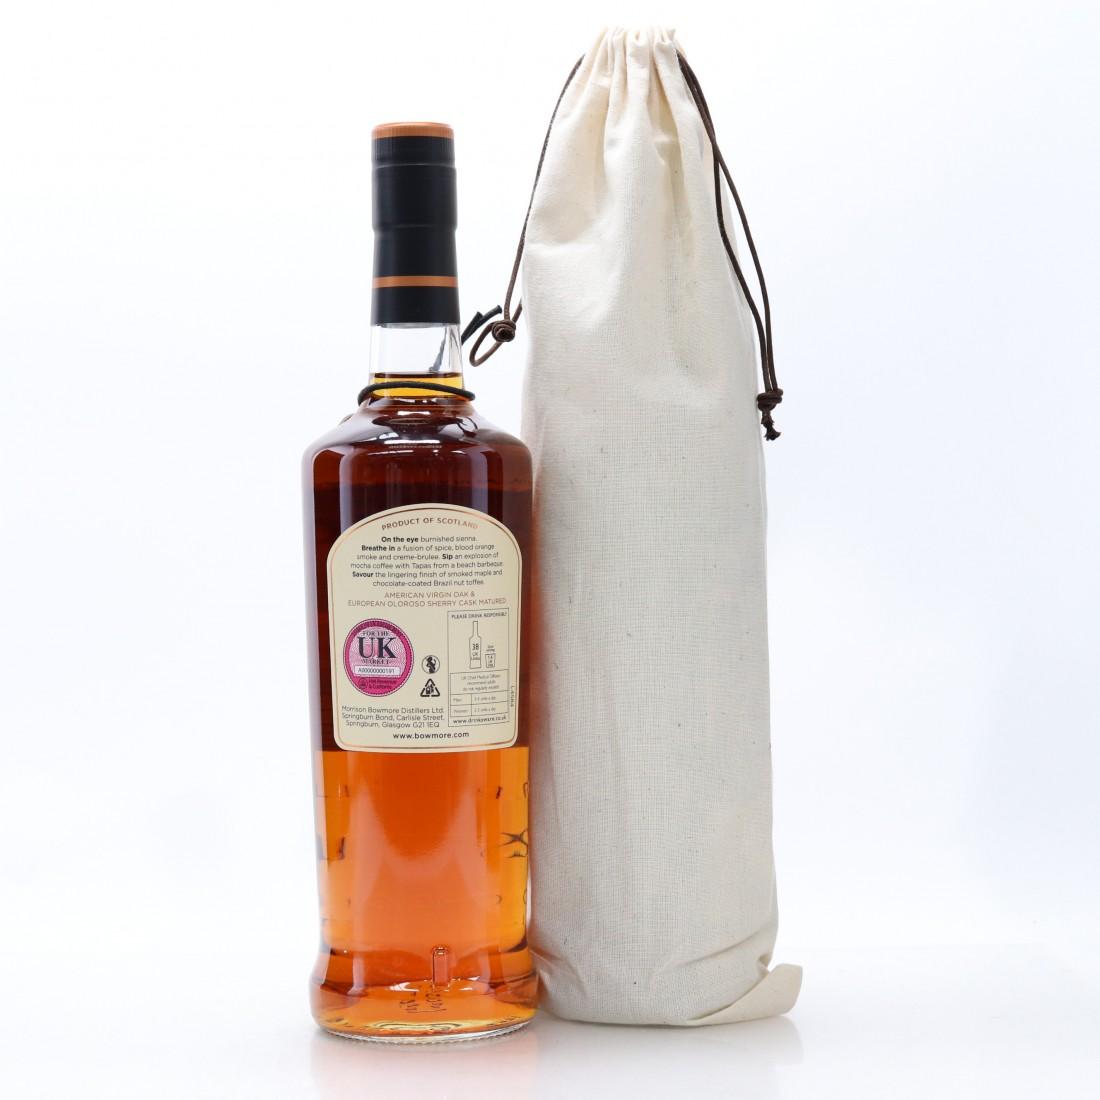 Bowmore American Virgin Oak and European Oloroso Sherry / Feis Ile 2016